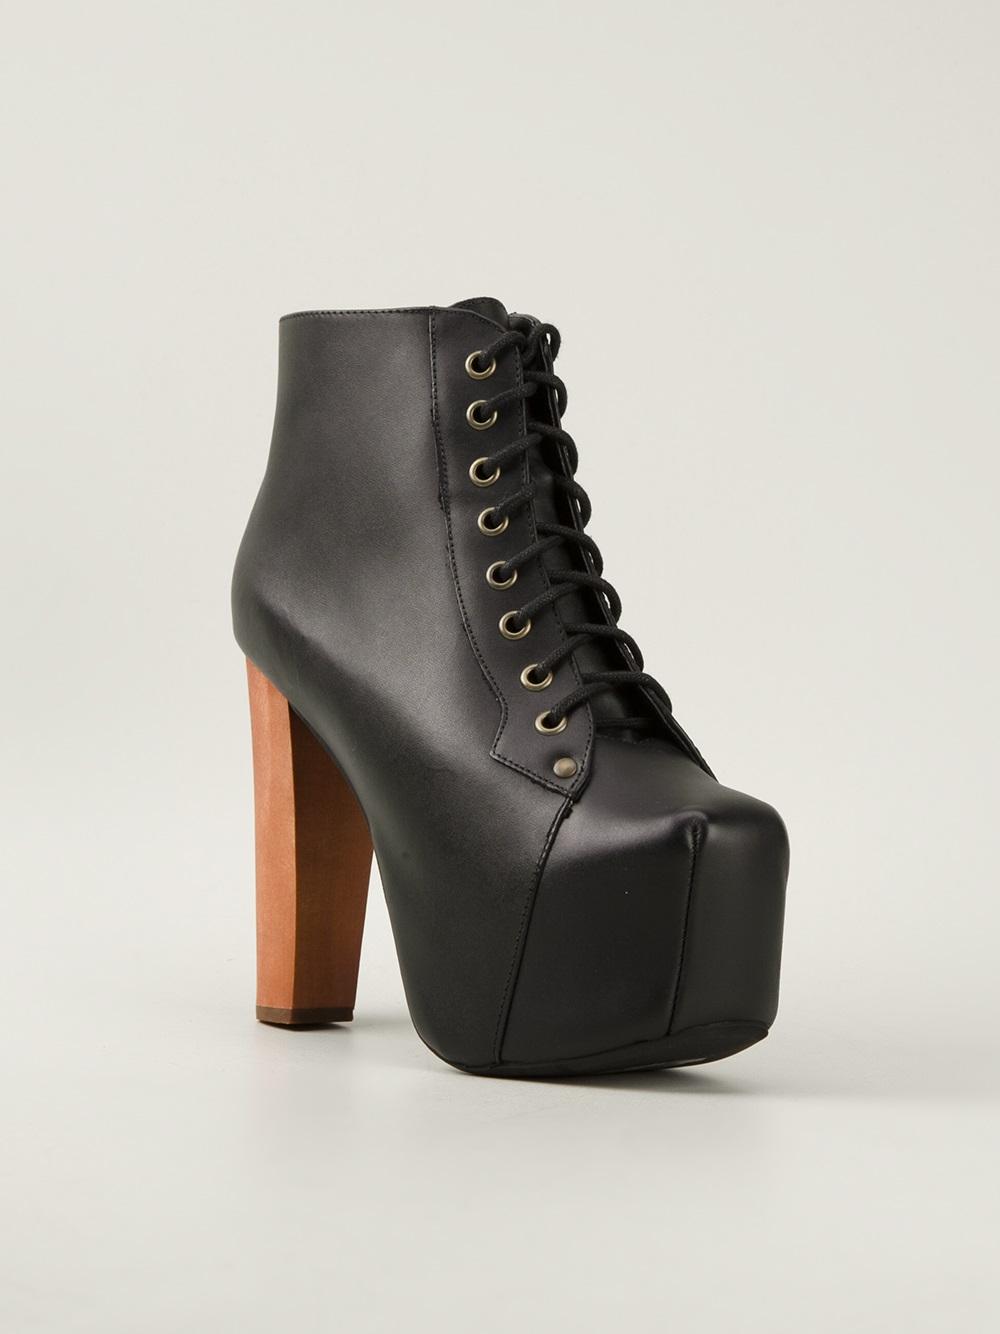 Jeffrey campbell lita platform pumps in black lyst - Jeffrey campbell lita platform boots ...